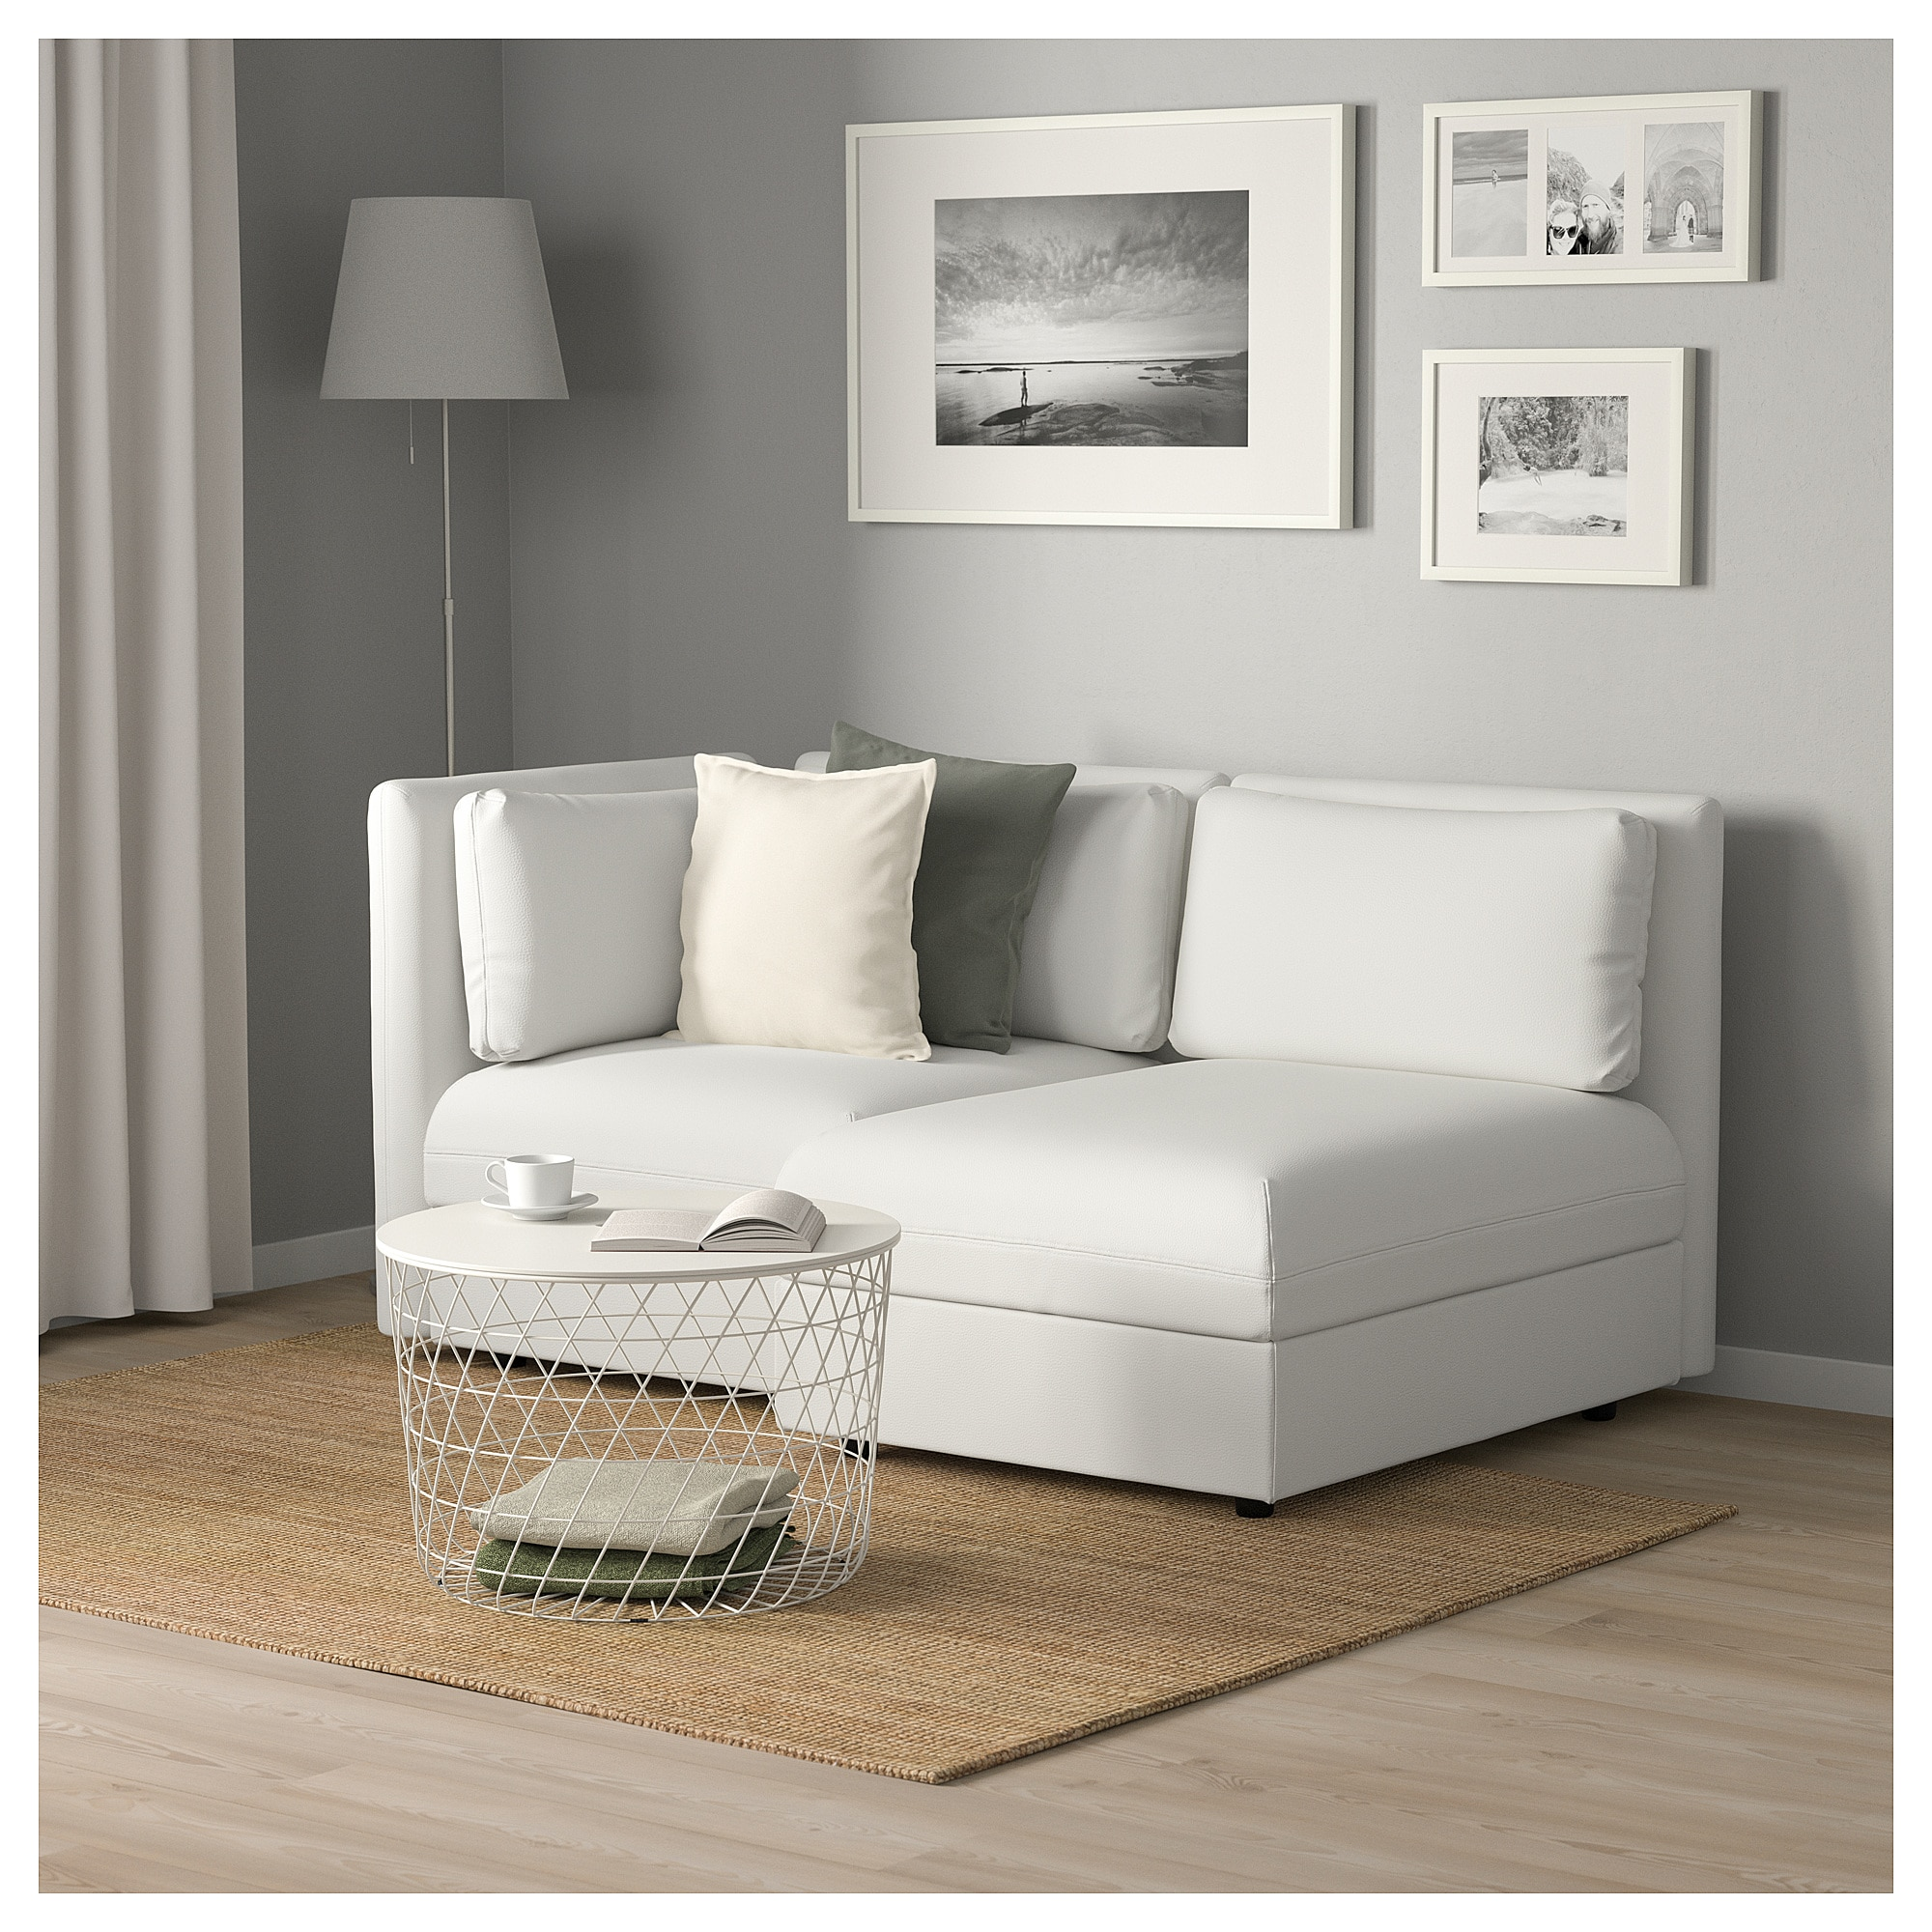 Ikea Vallentuna Modular Loveseat With Storage Murum White Modular Sofa Love Seat Decorate Your Room